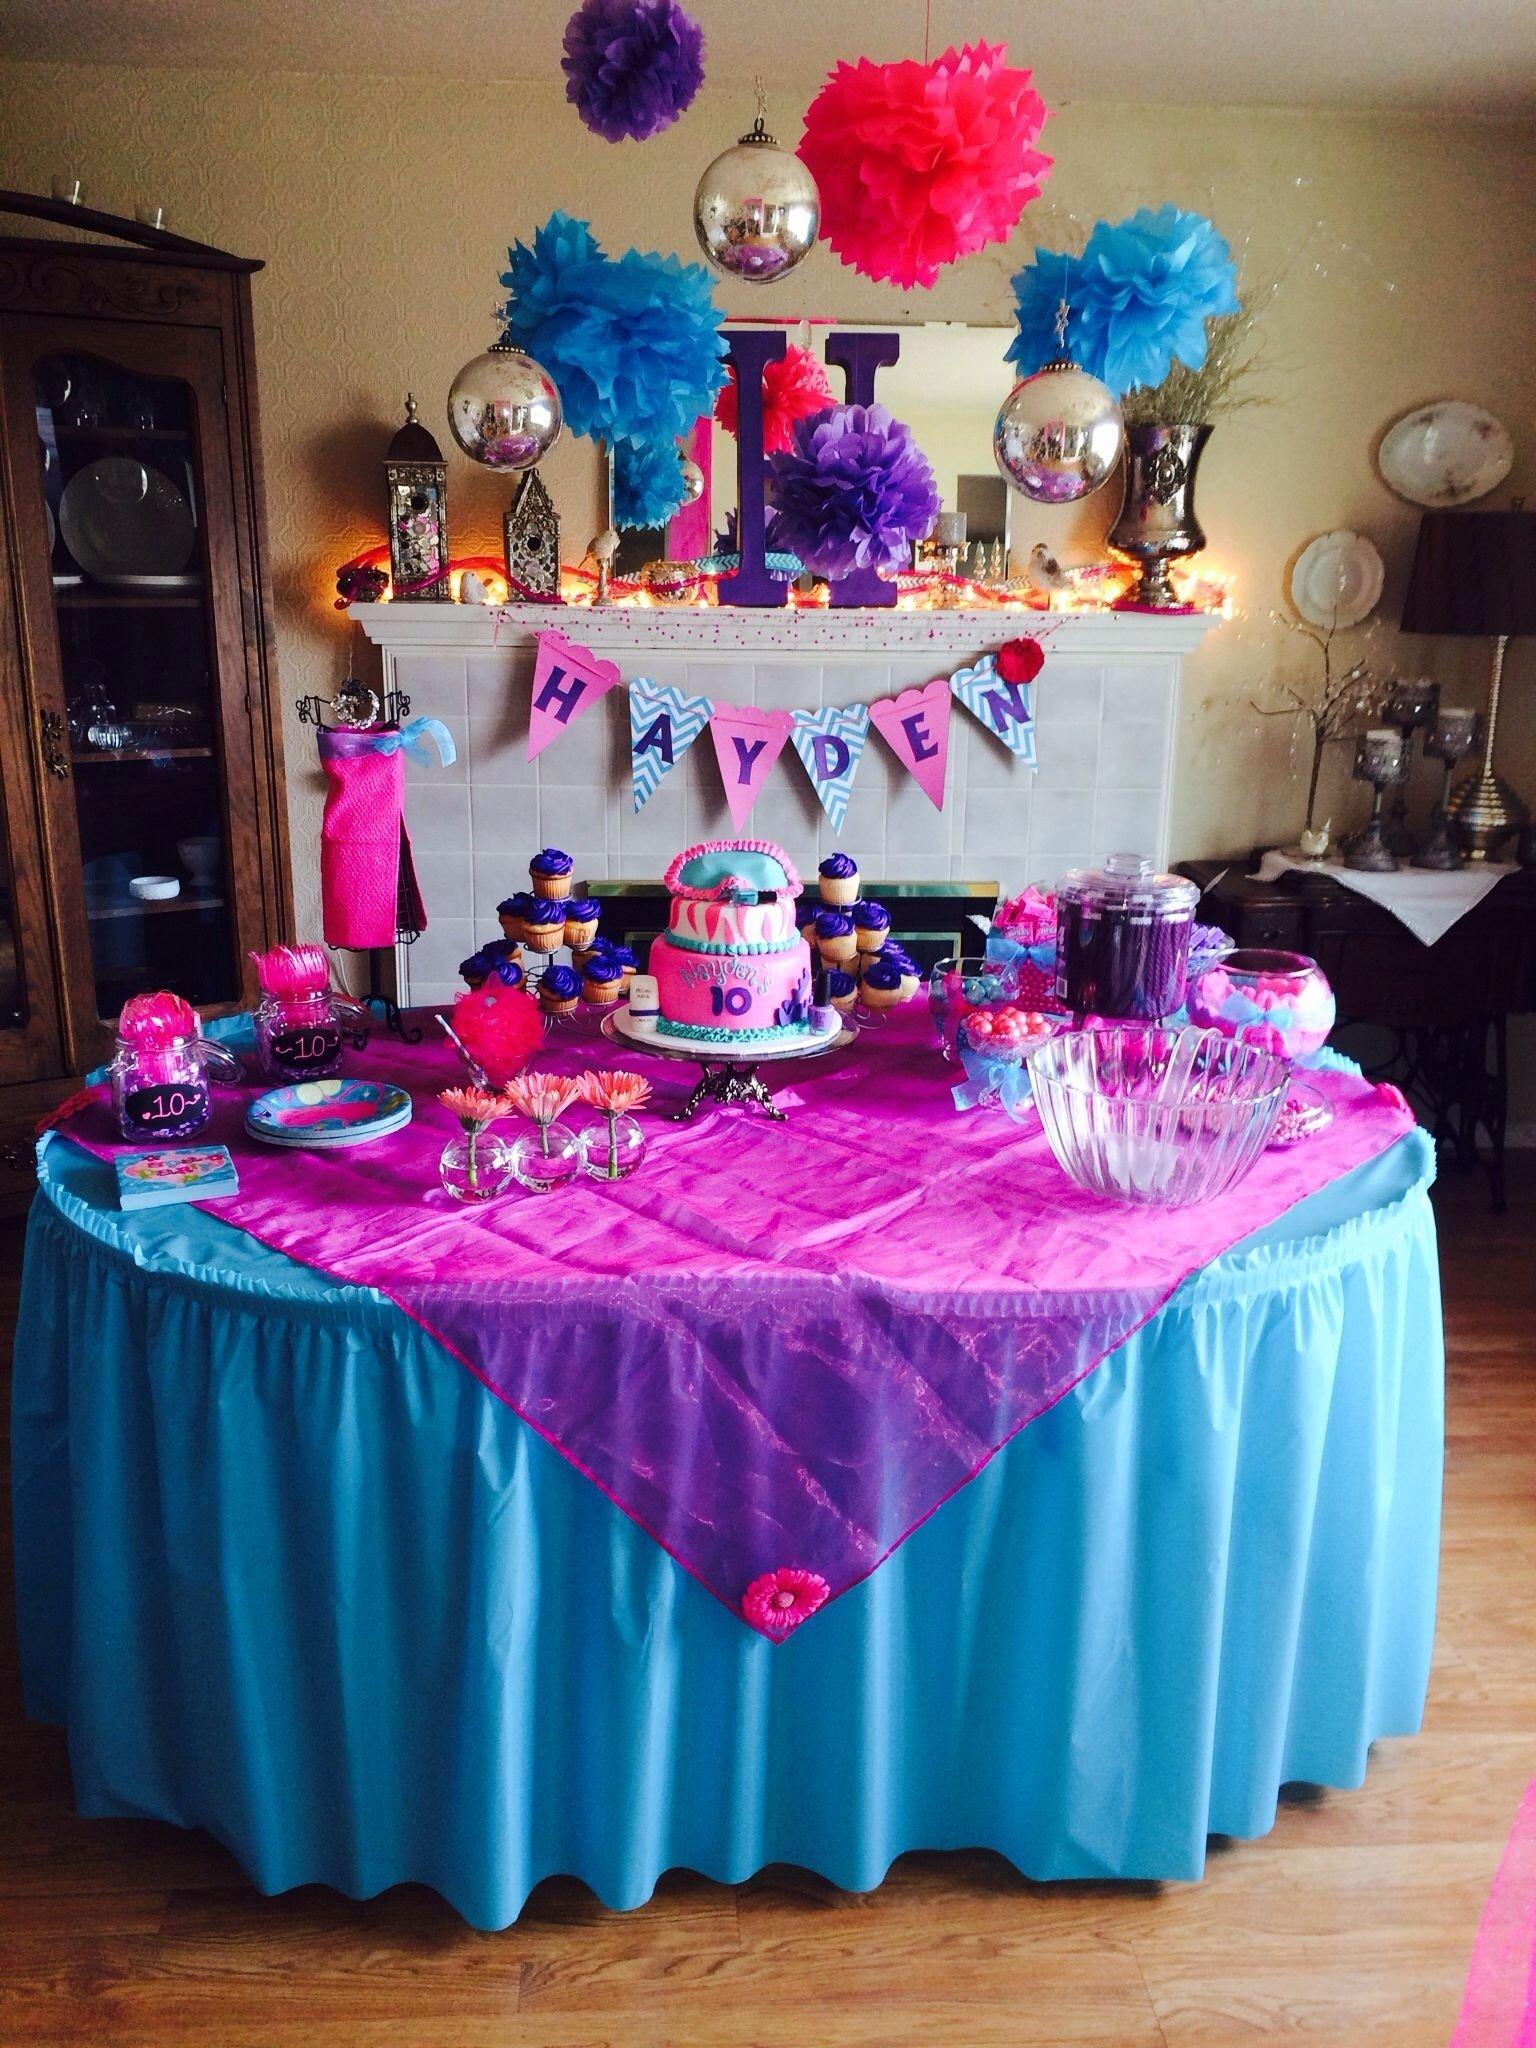 10 Stunning 10 Year Girl Birthday Party Ideas girls 10th birthday party party ideas pinterest 10th birthday 1 2021